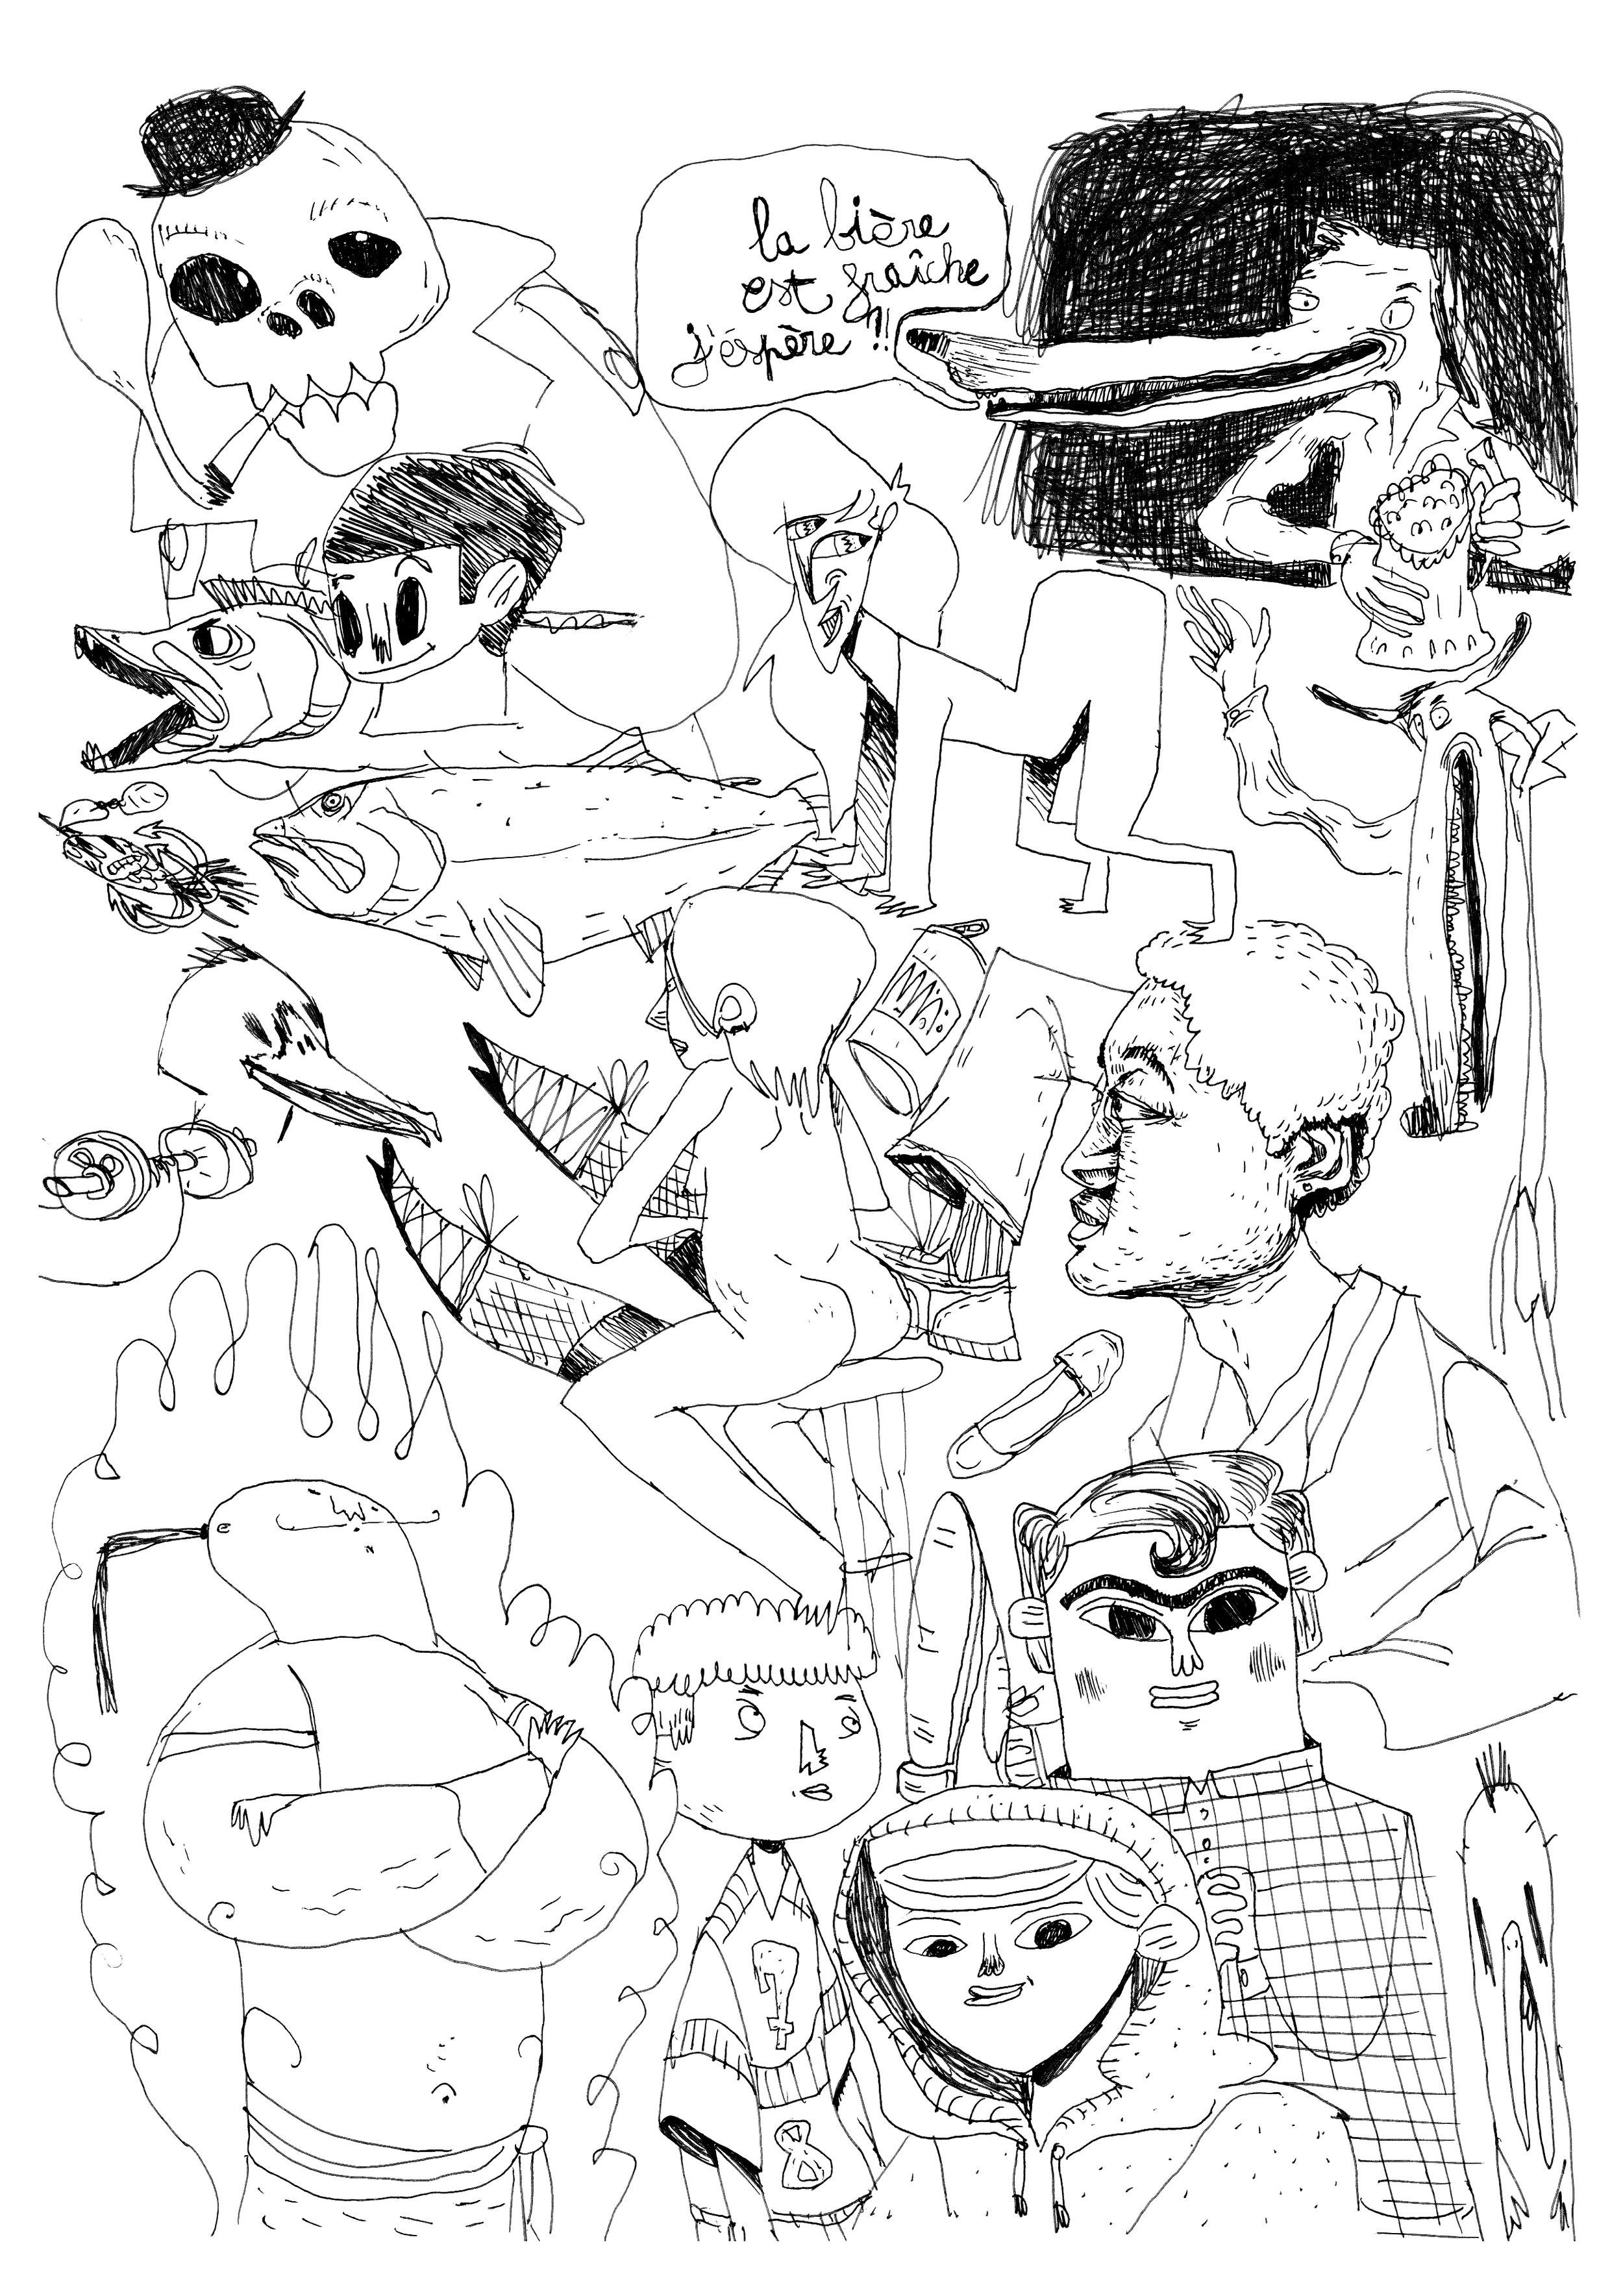 Pascal_Zaffiro_Doodle_14.jpg